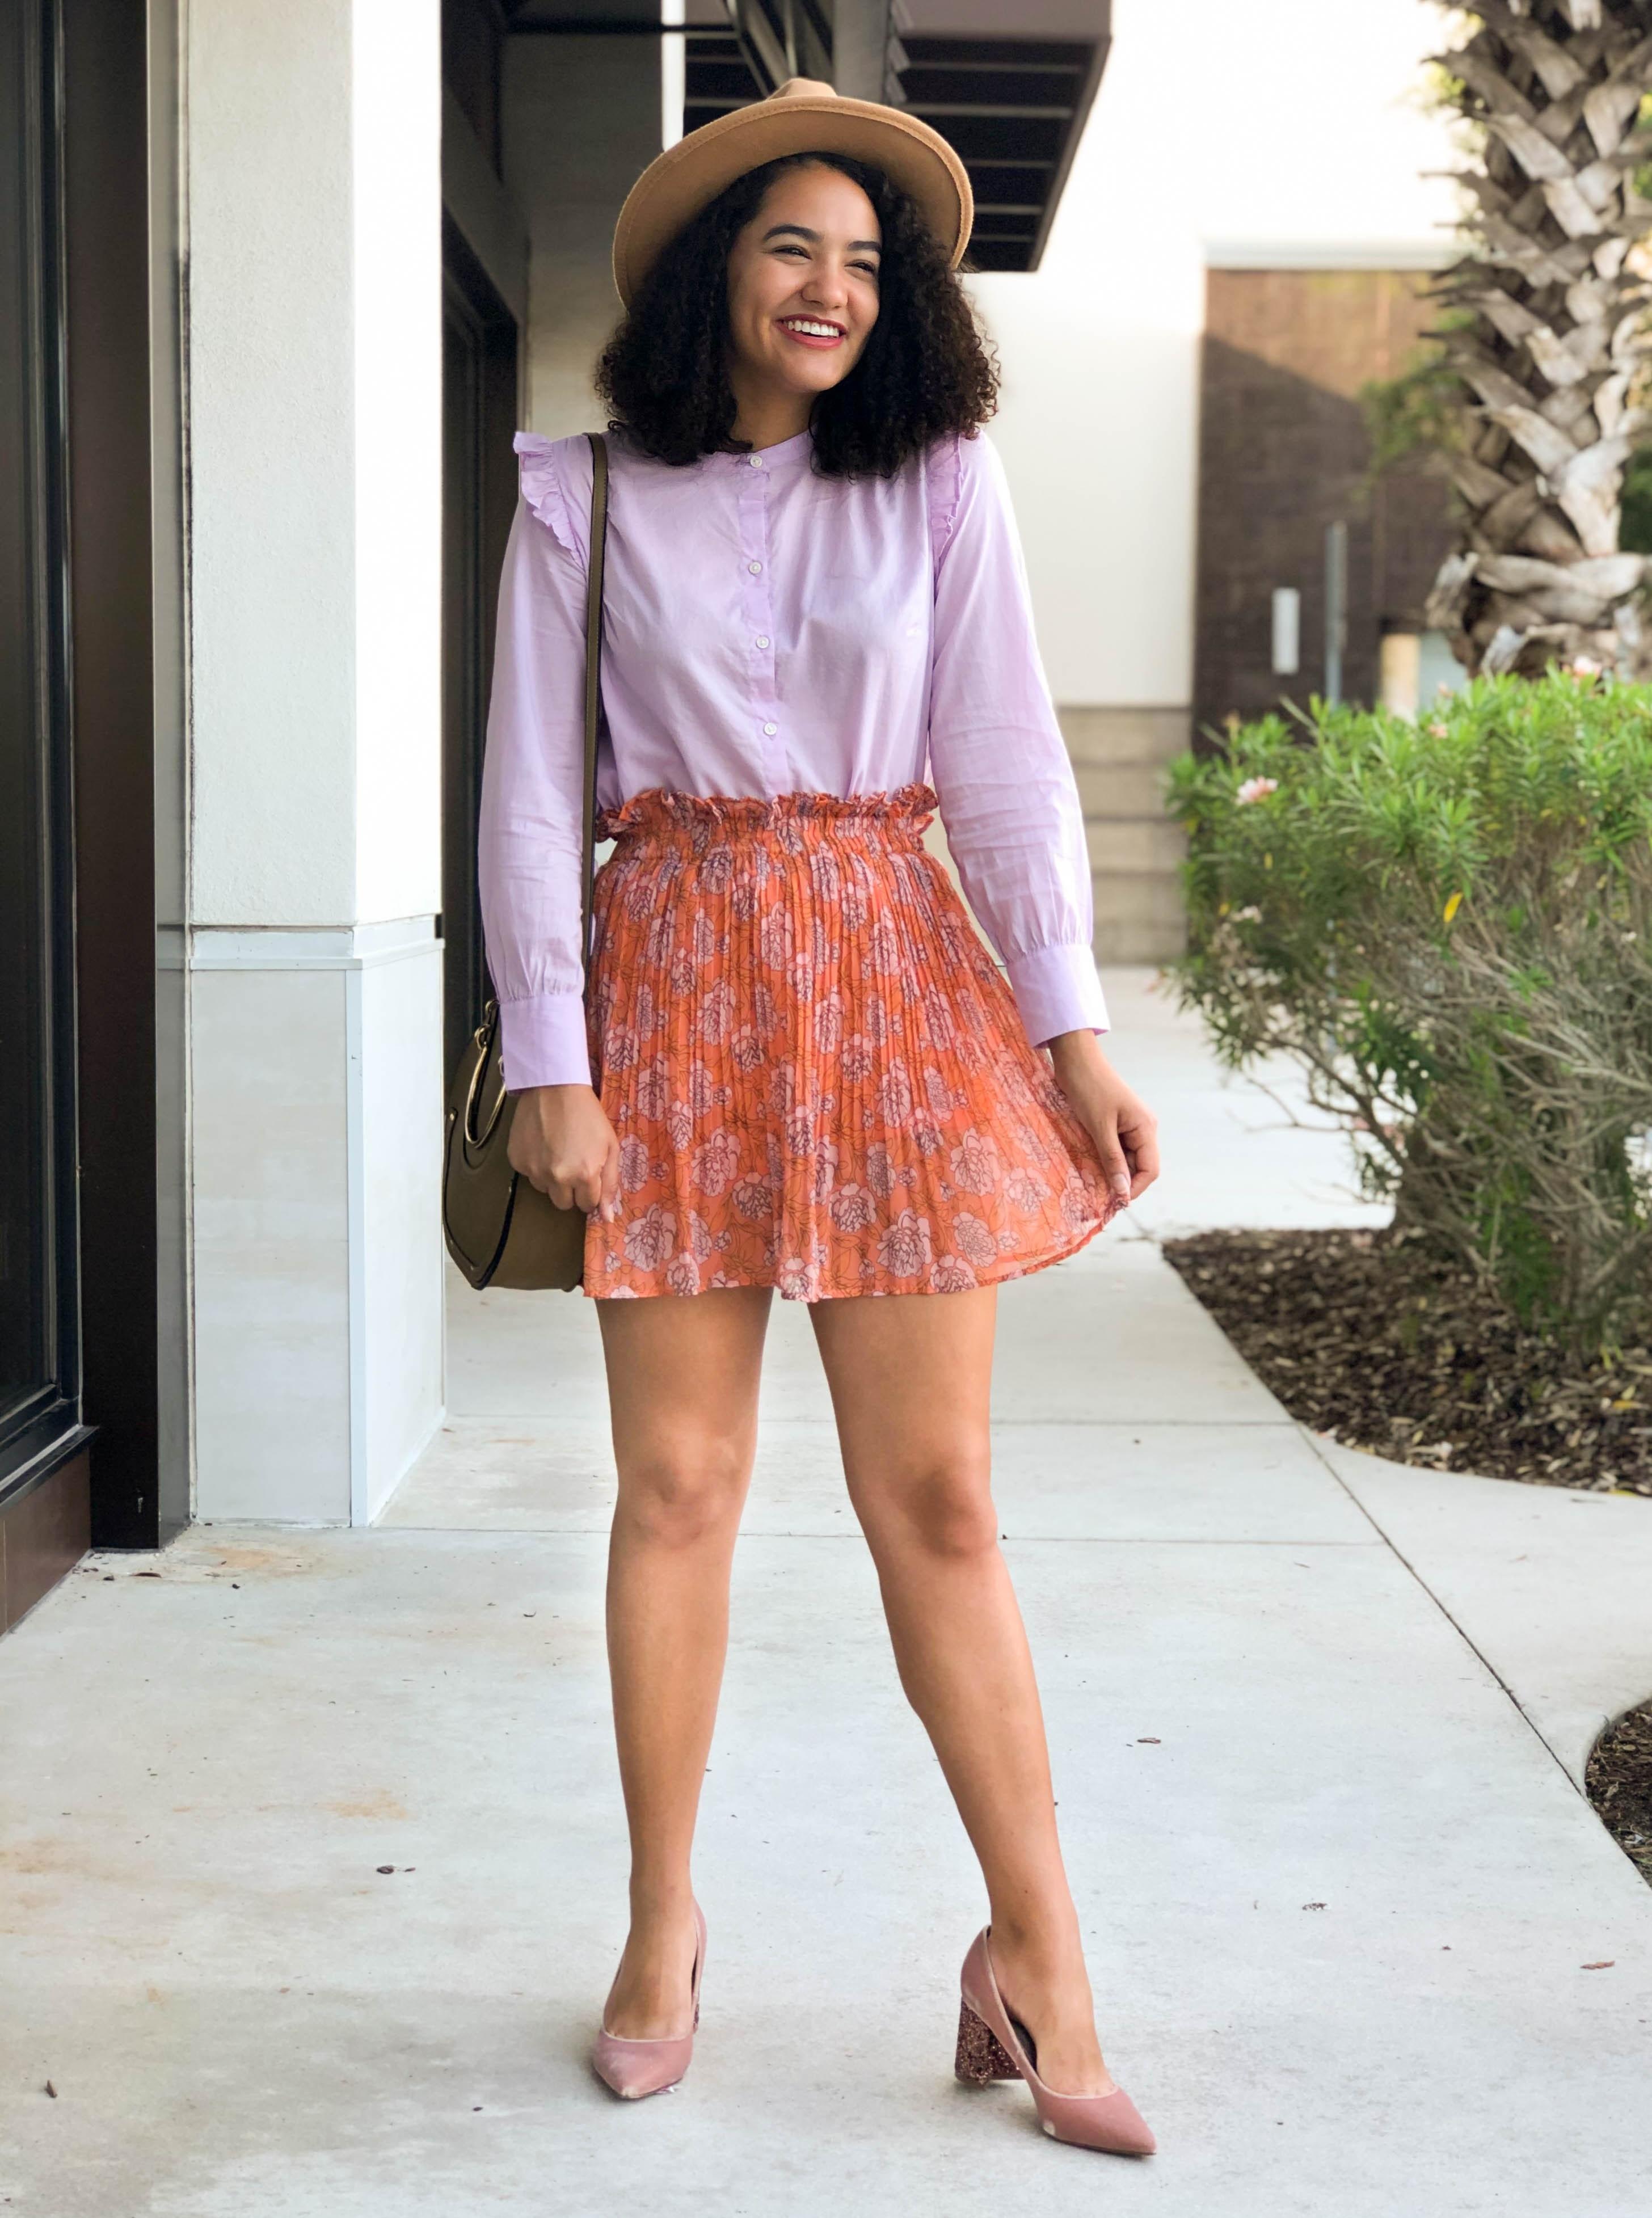 Floral Chicwish Skirt, Purple Ruffle Sleeve Top, Pink Velvet Block Heels, Tan Panama Hat, and a Saddle bag